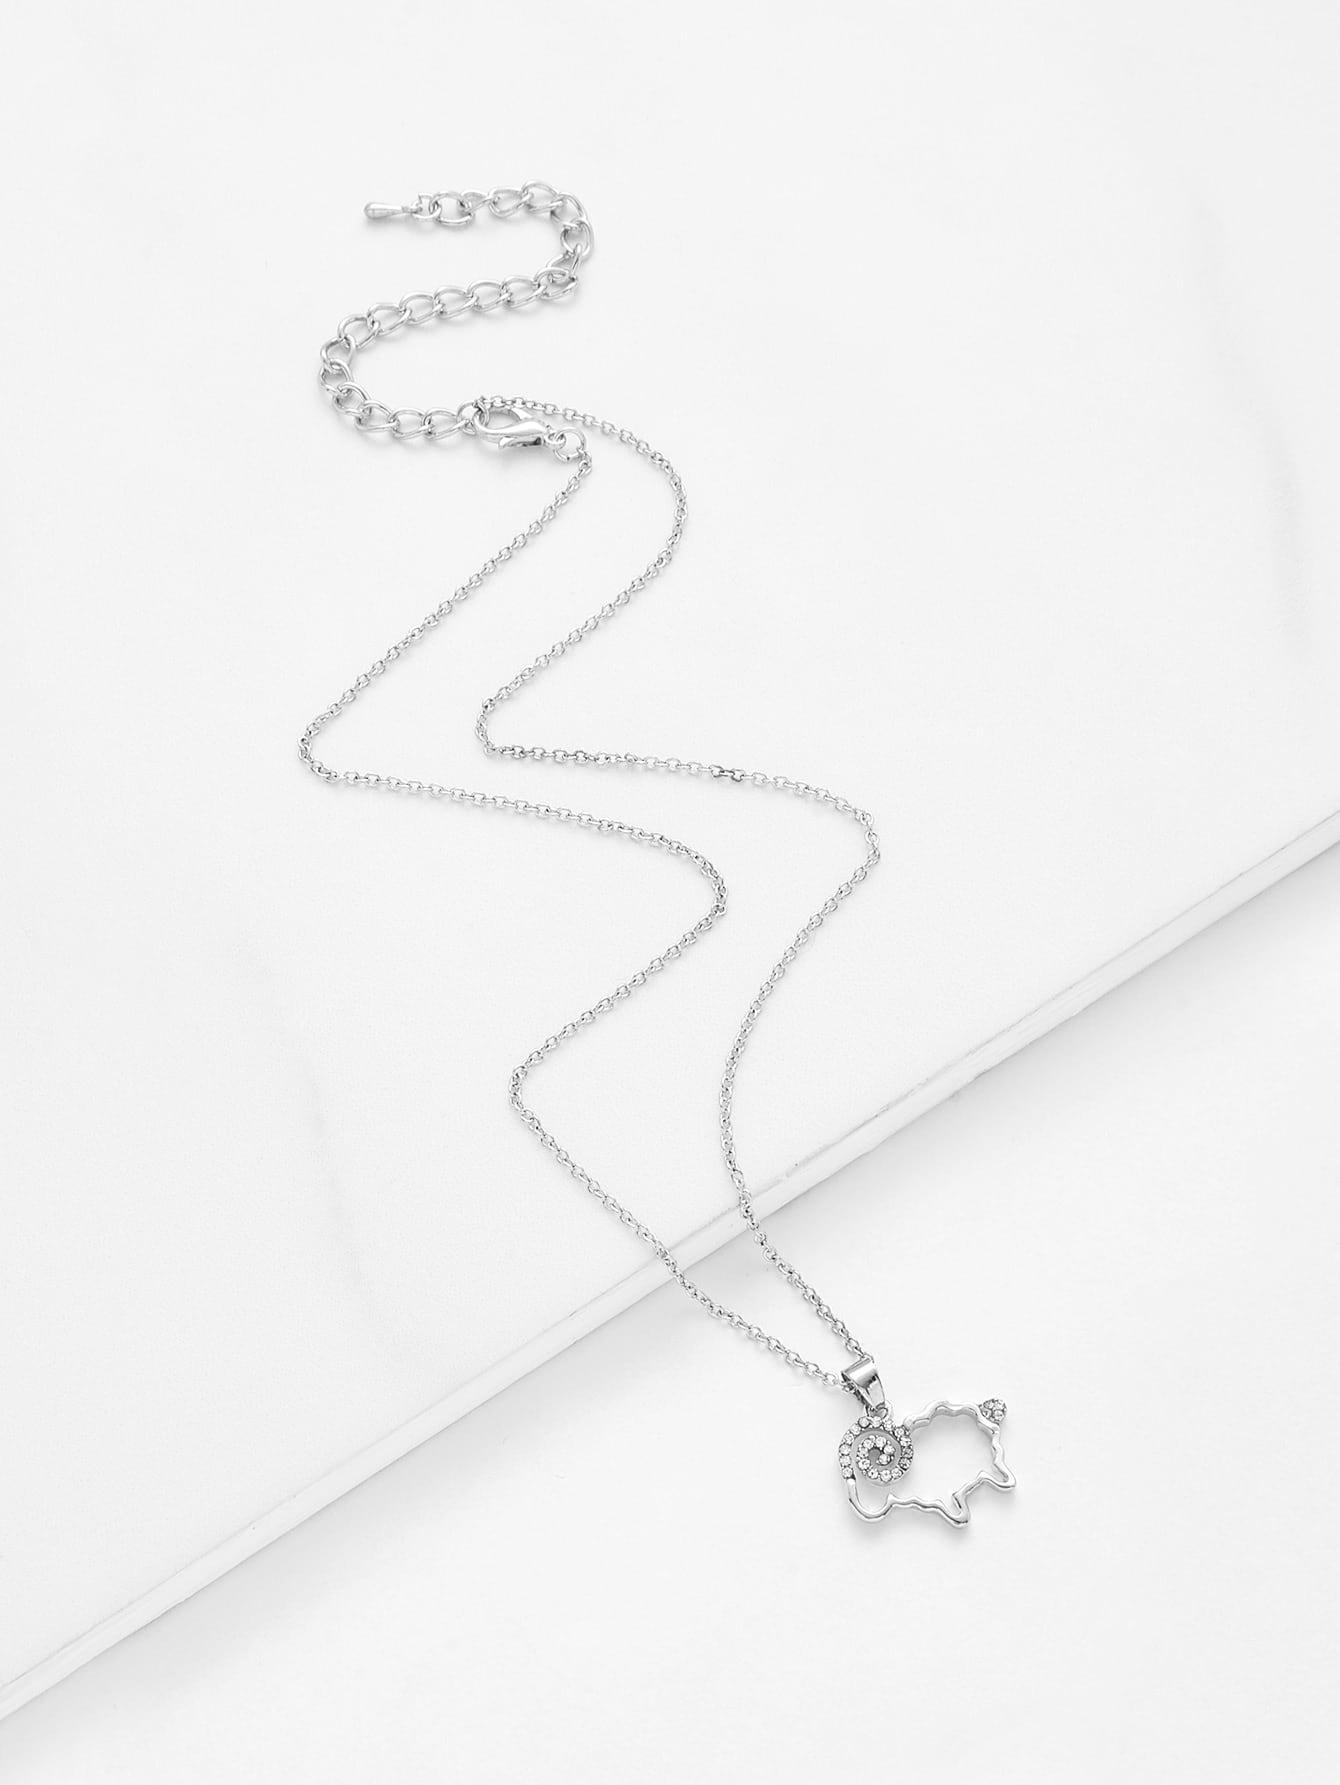 Rhinestone Detail Sheep Pendant Chain Necklace